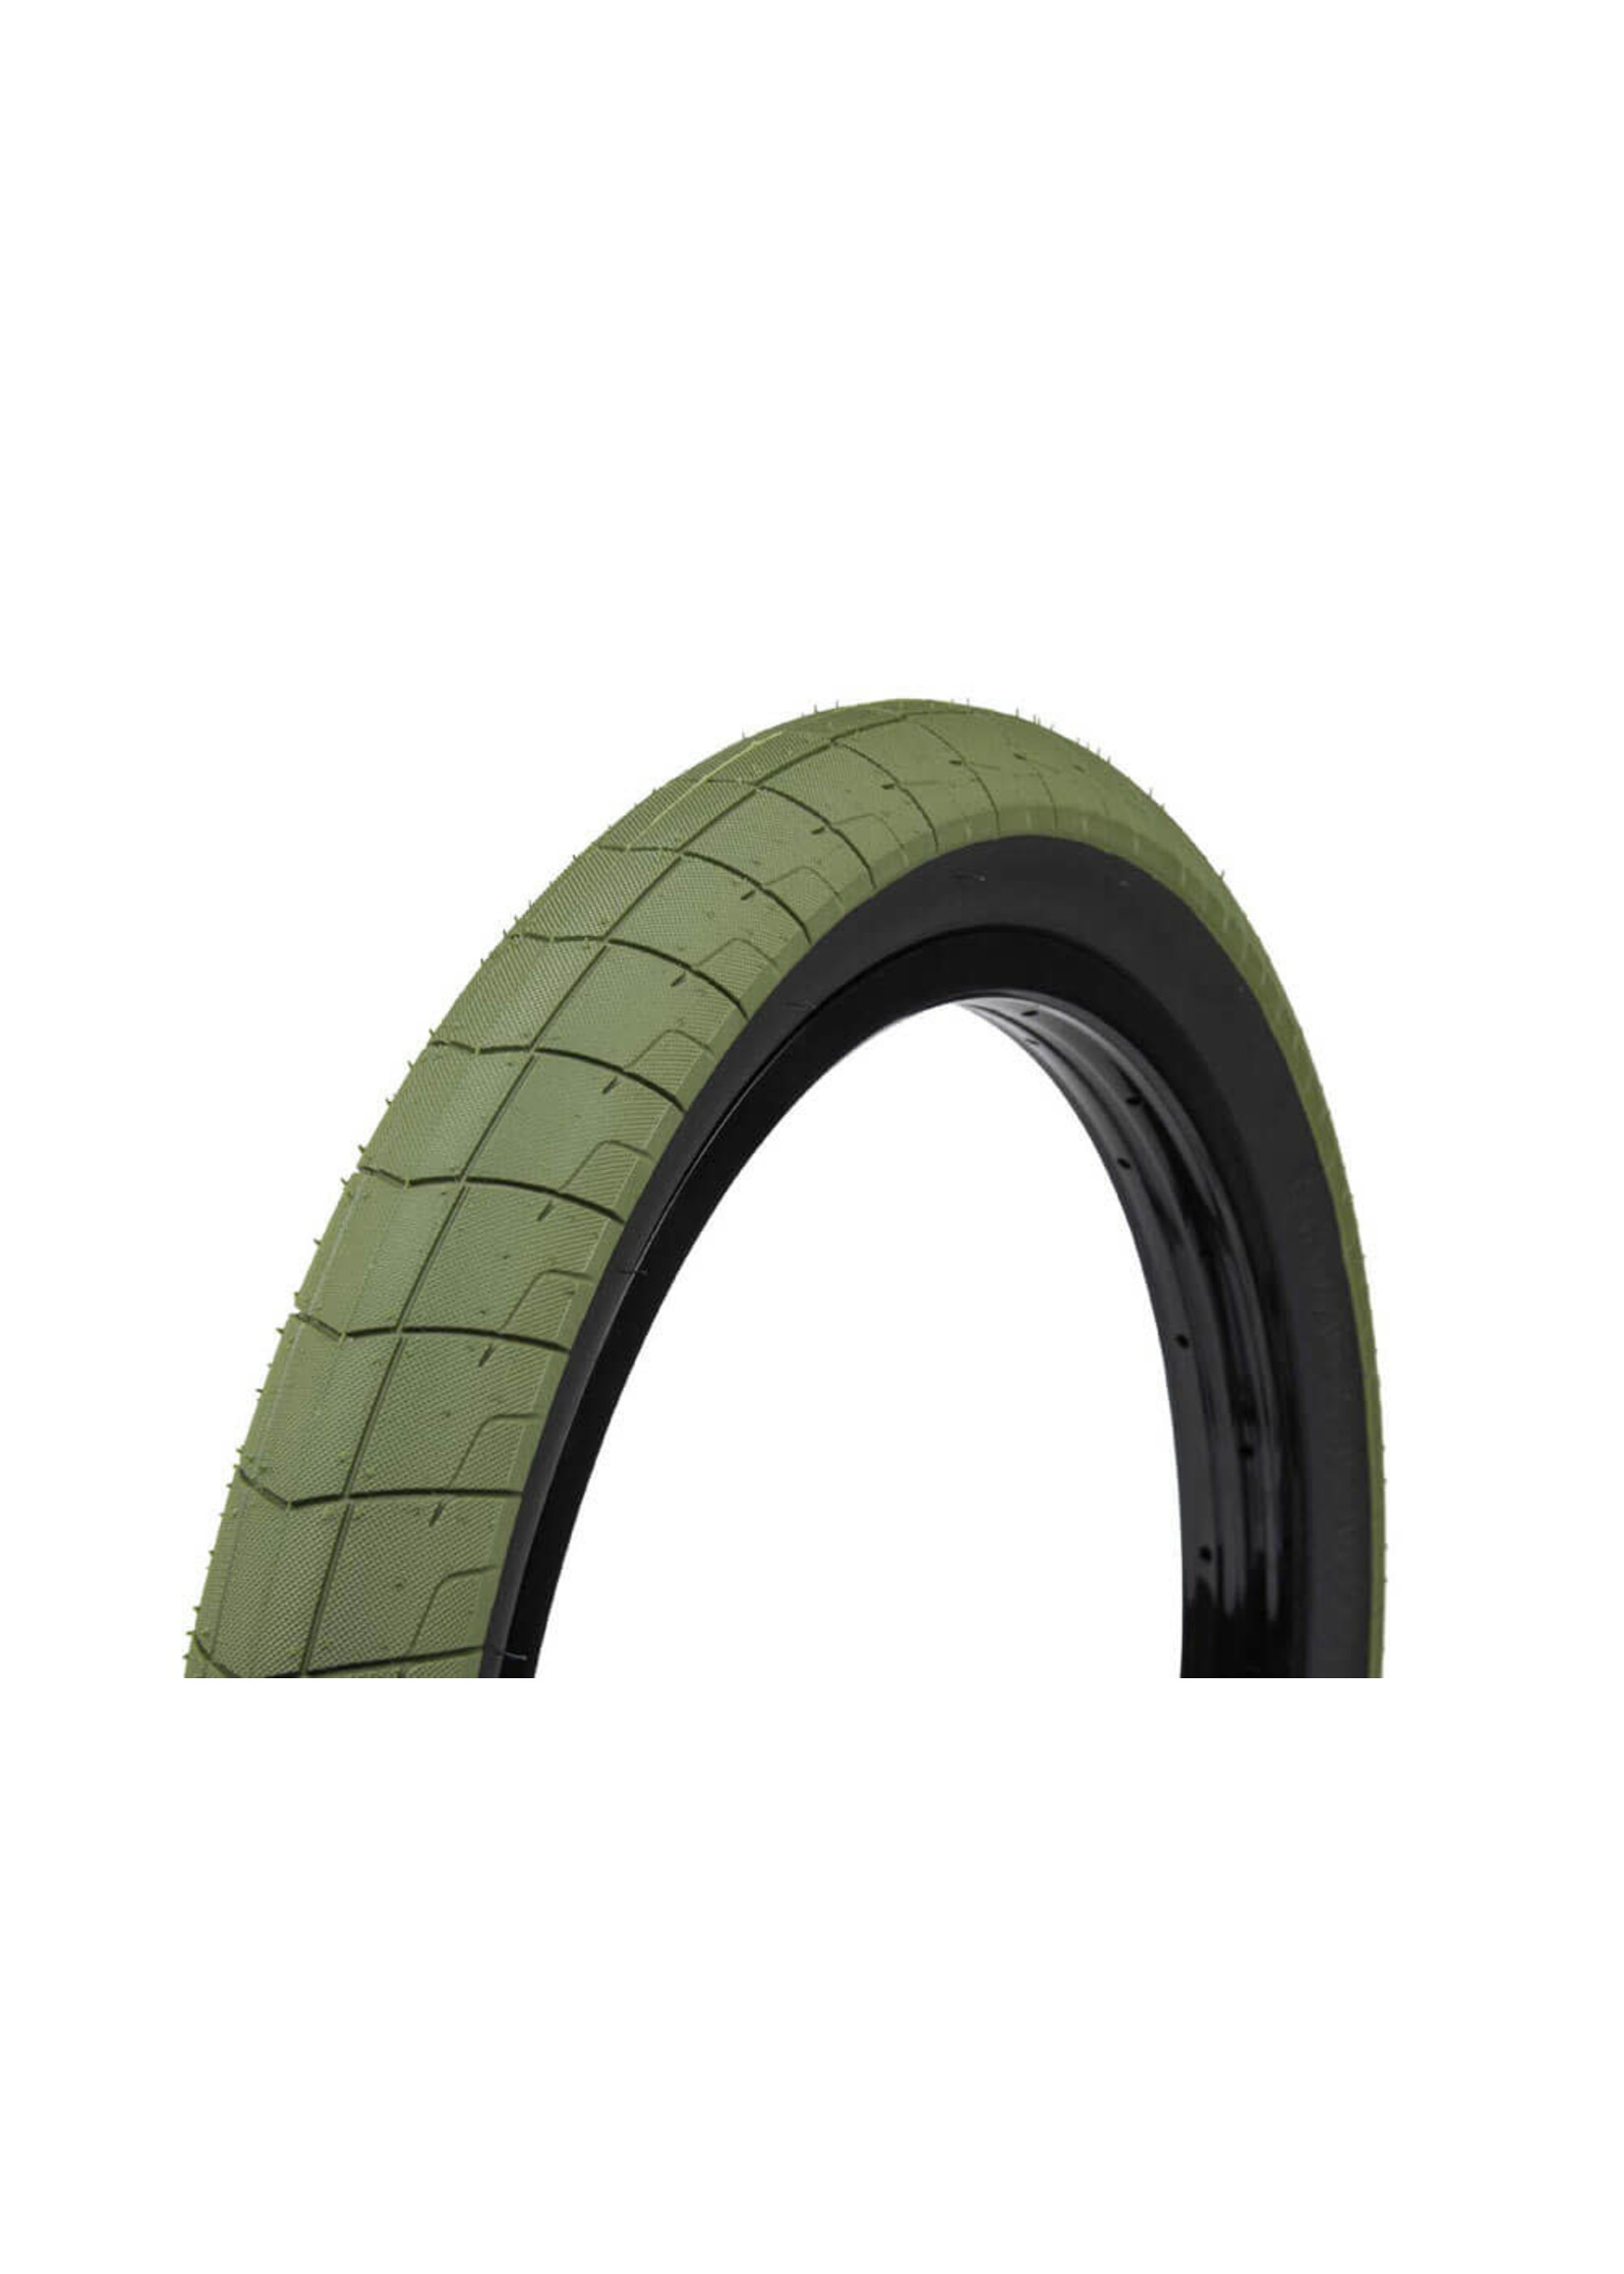 Eclat Eclat - Fireball Tires - 20x2.30